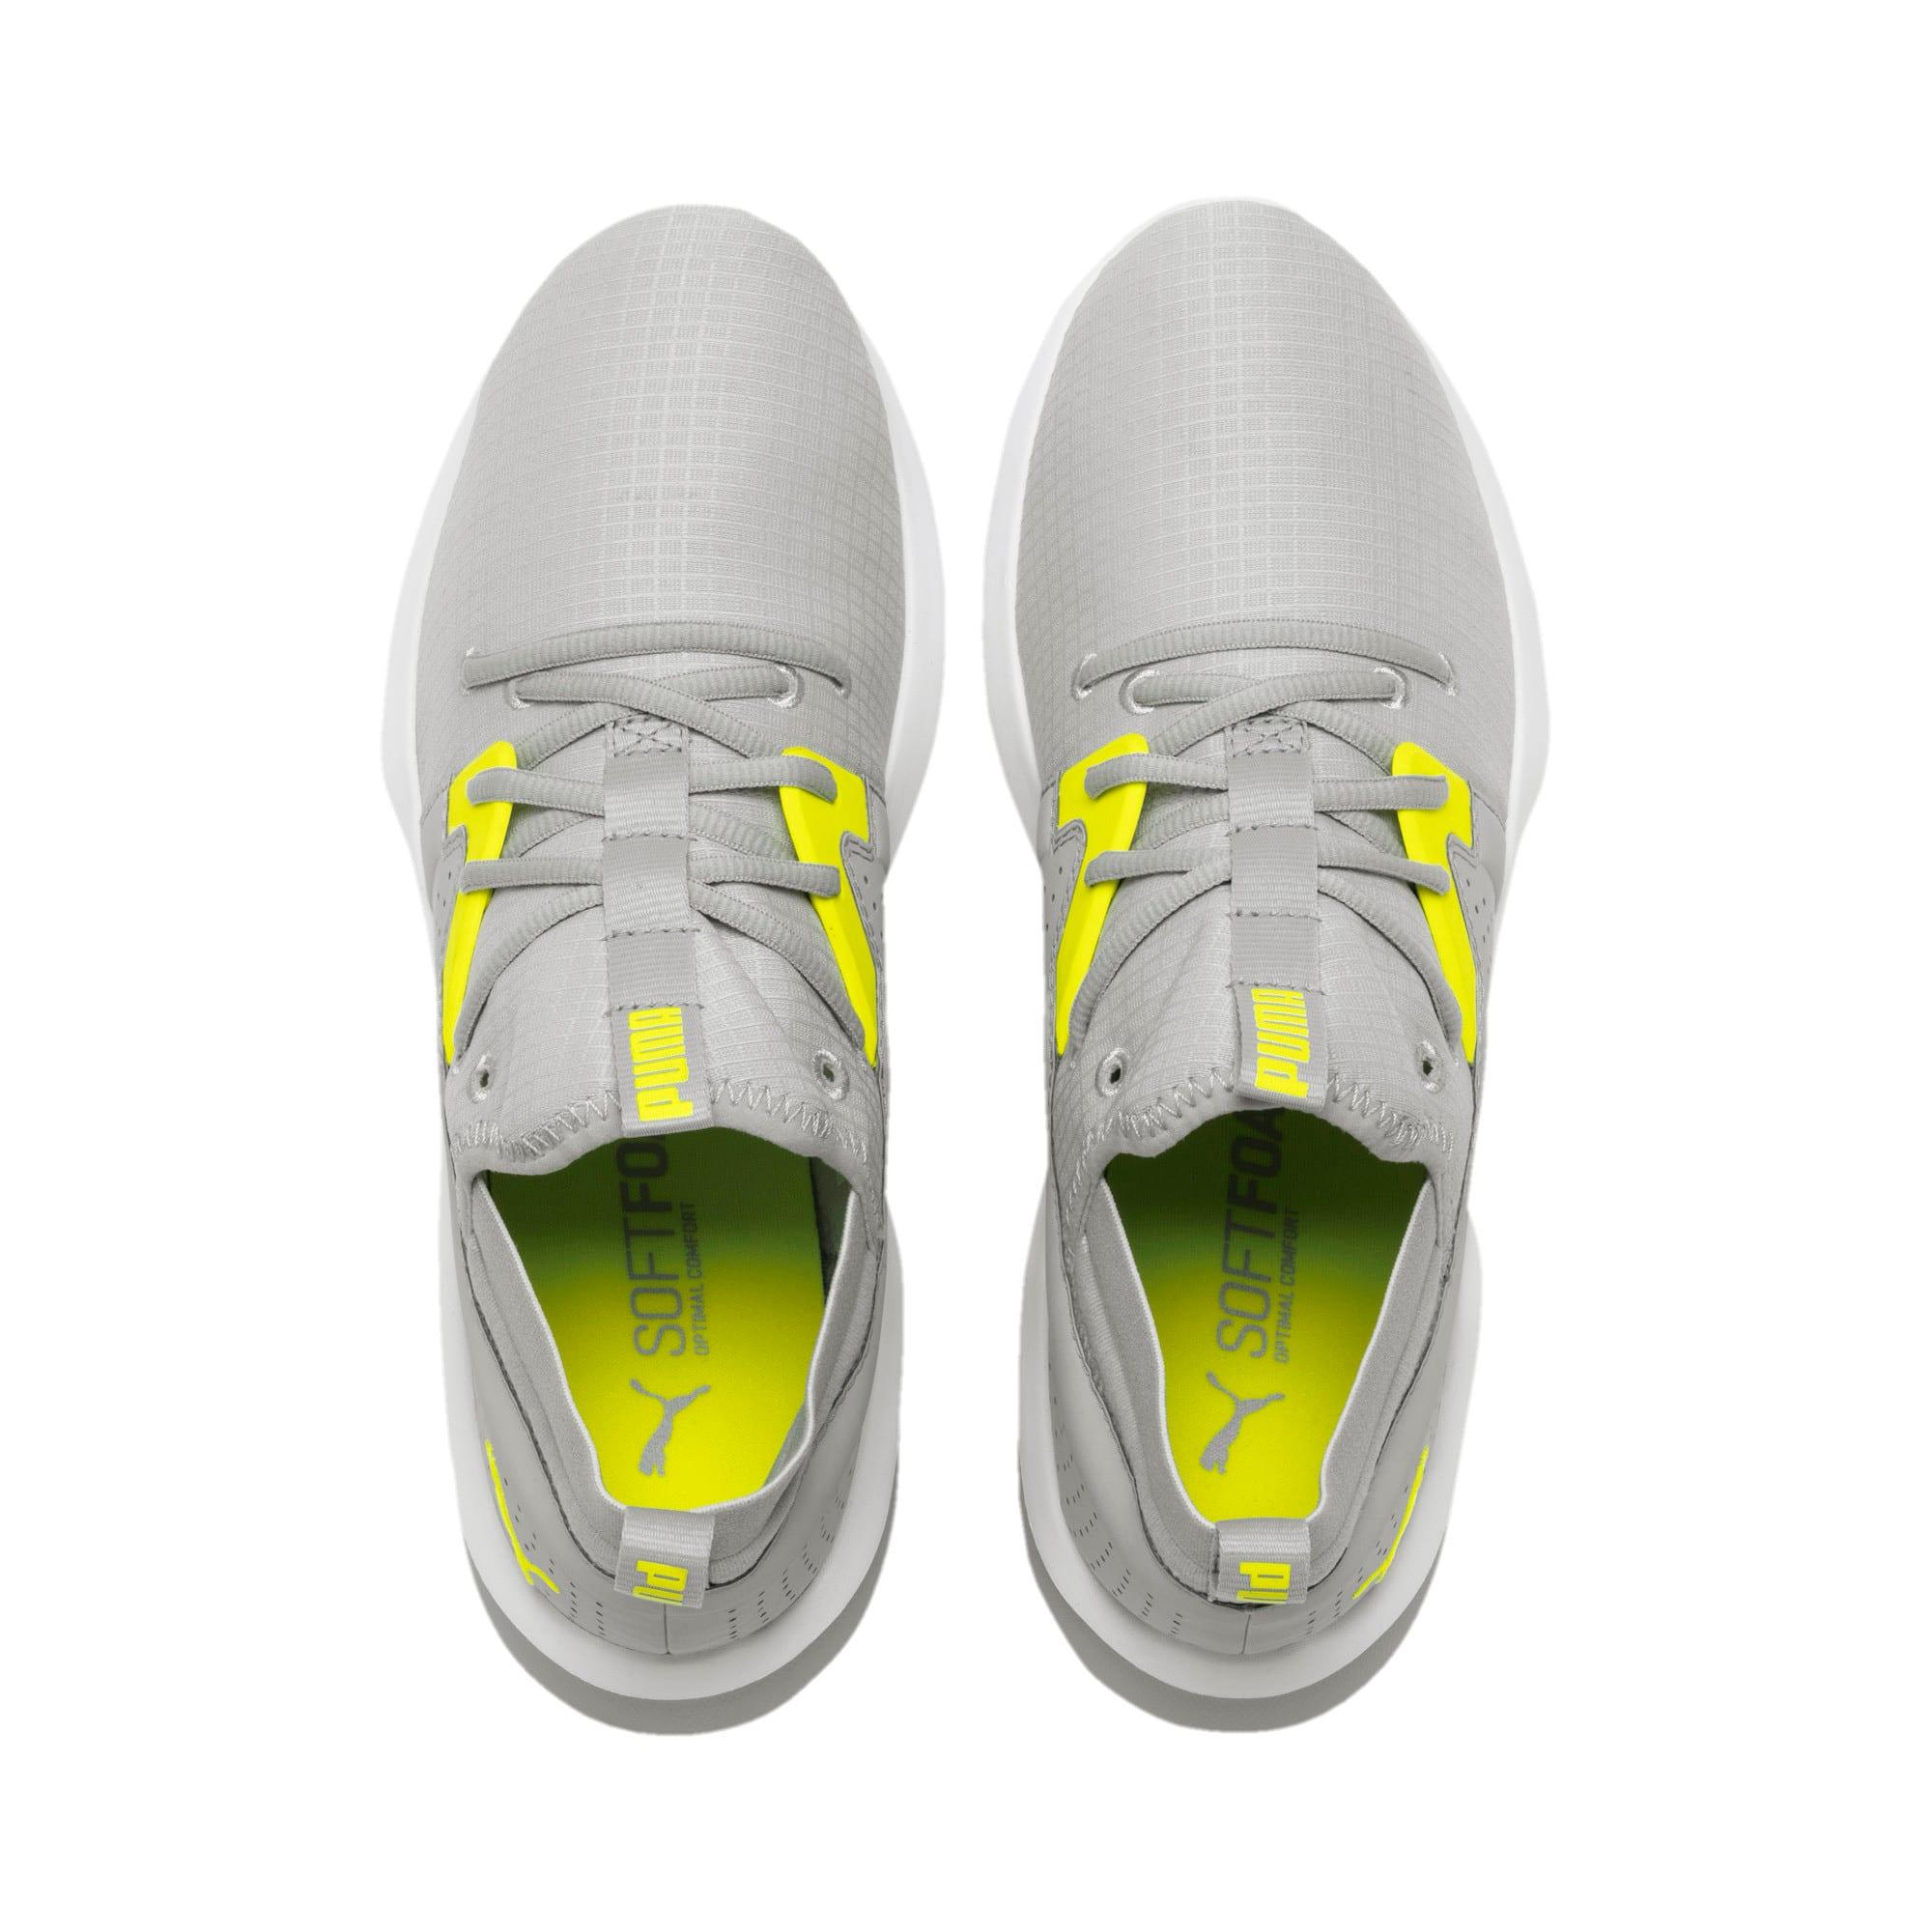 Thumbnail 8 of Emergence Lights Men's Running Shoes, High Rise-Yellow Alert, medium-IND